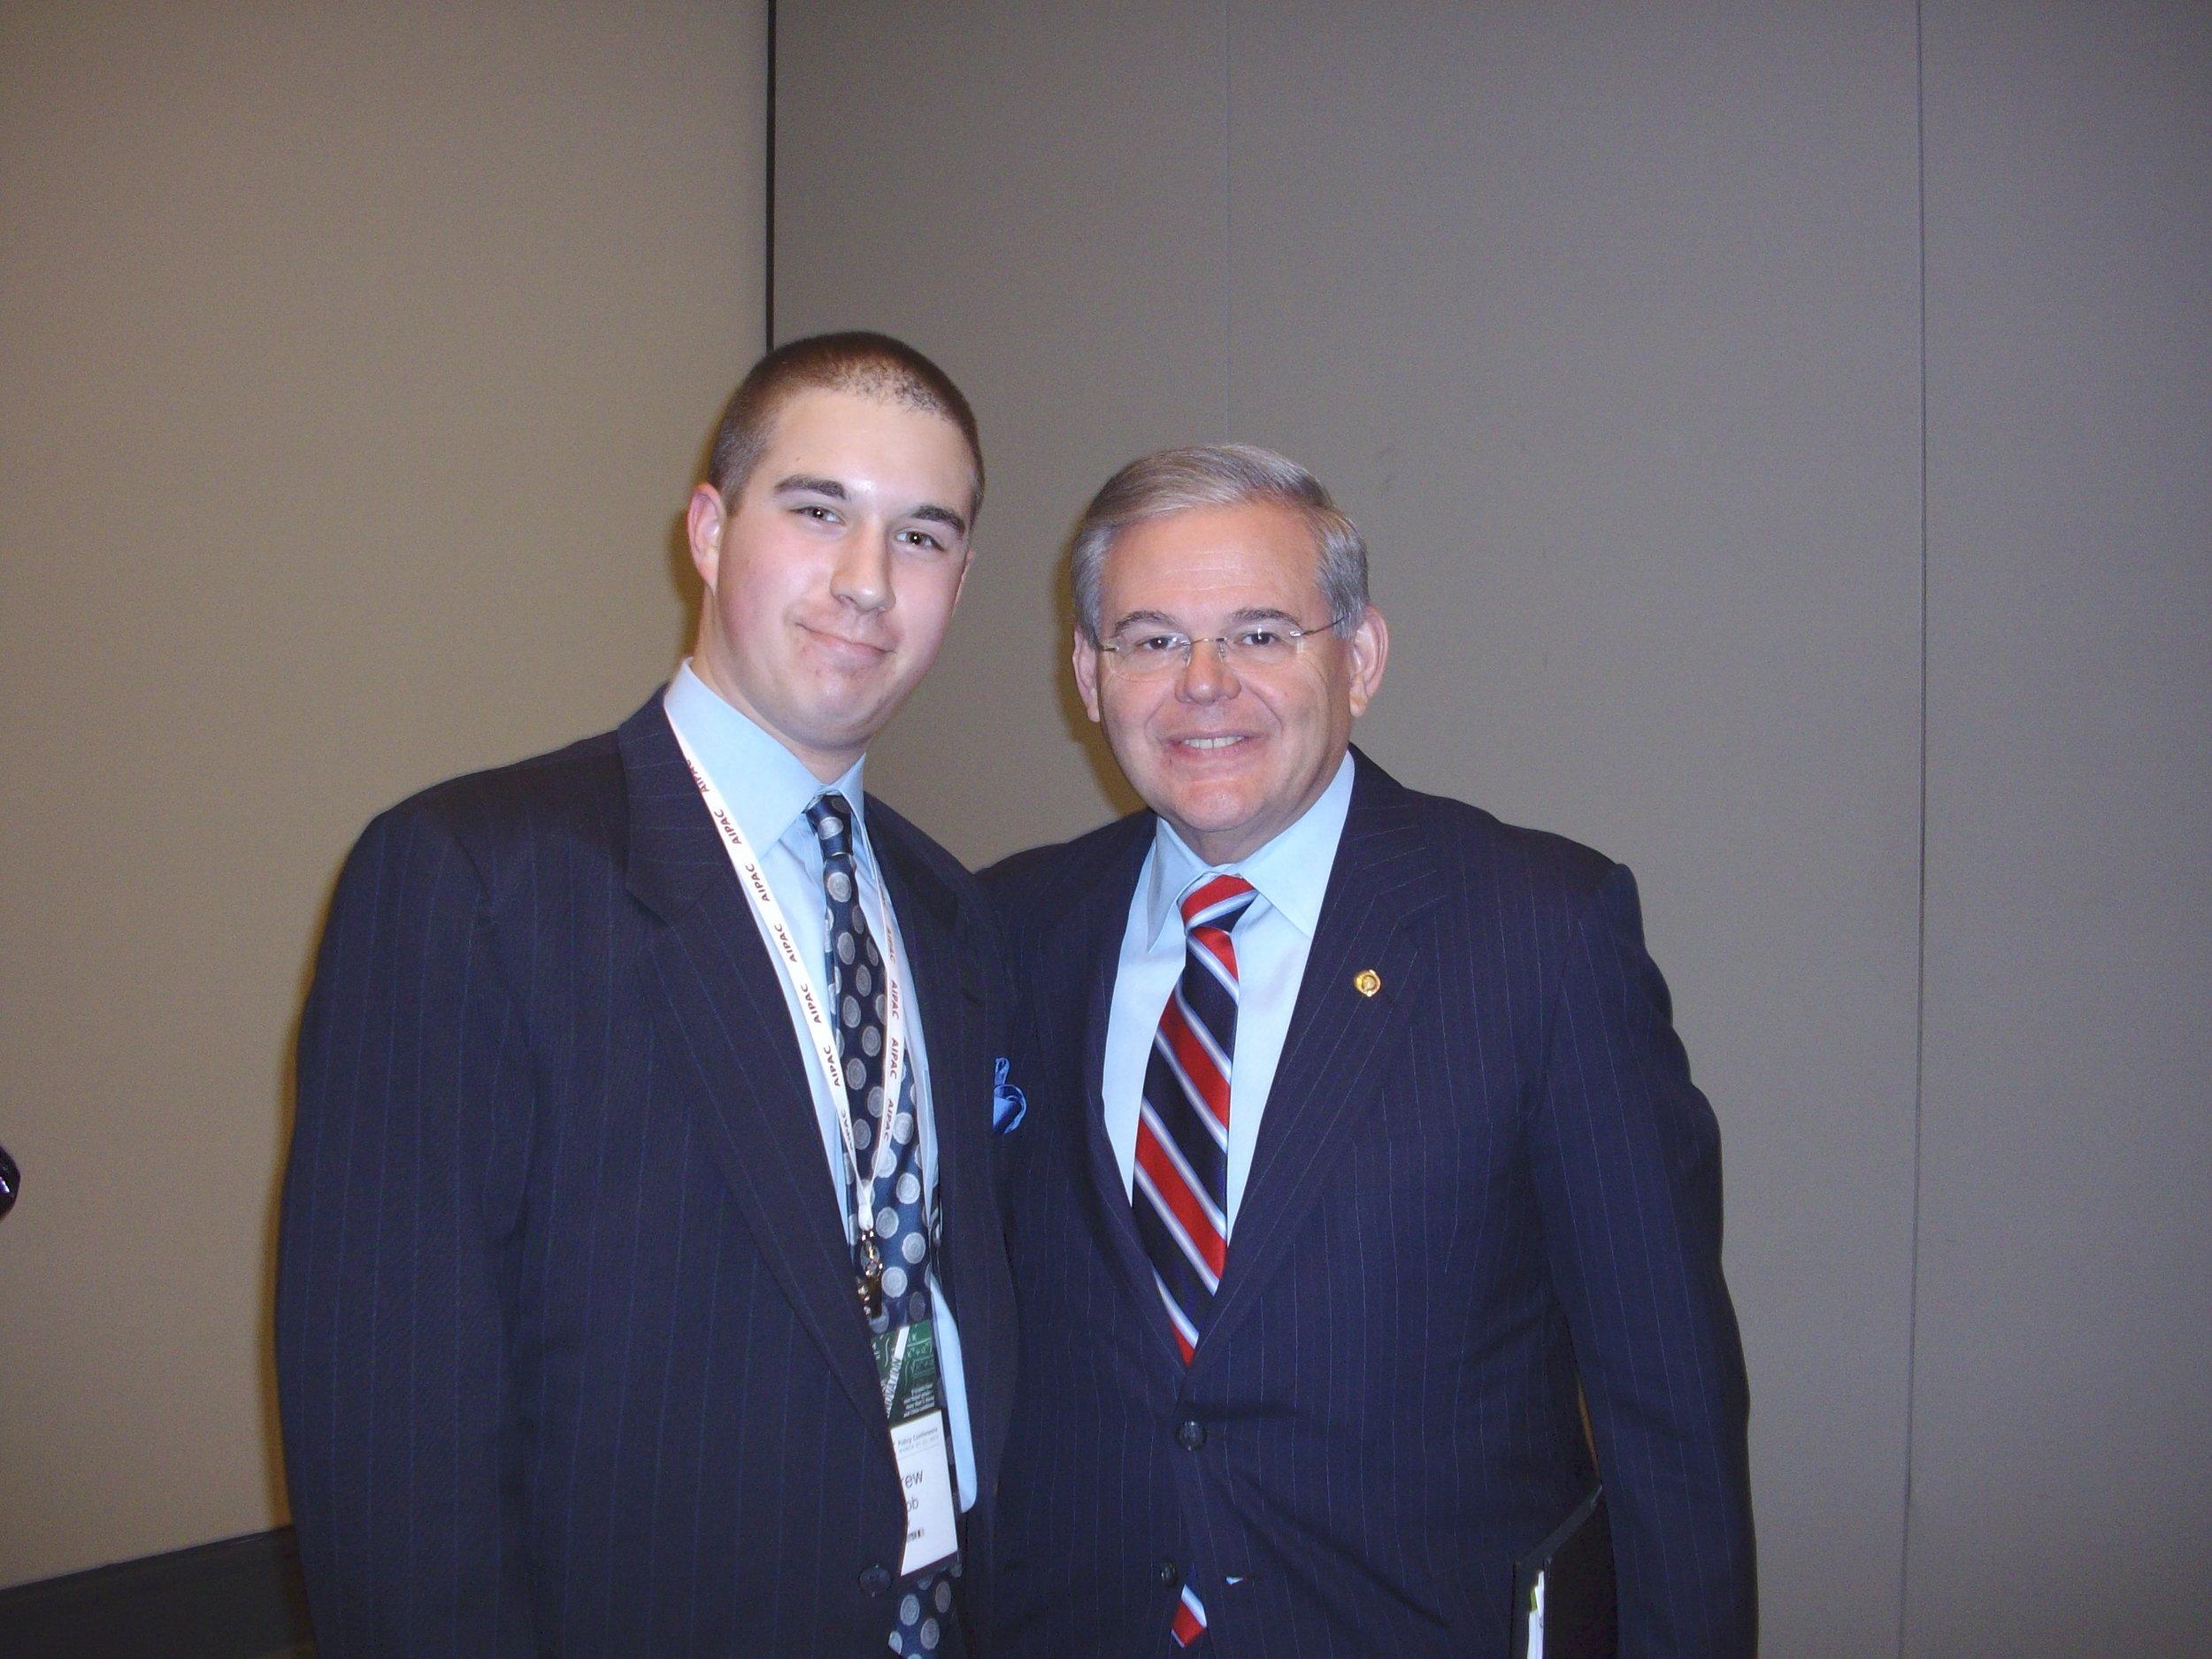 With Senator Bob Menendez (D-NJ), May 2010